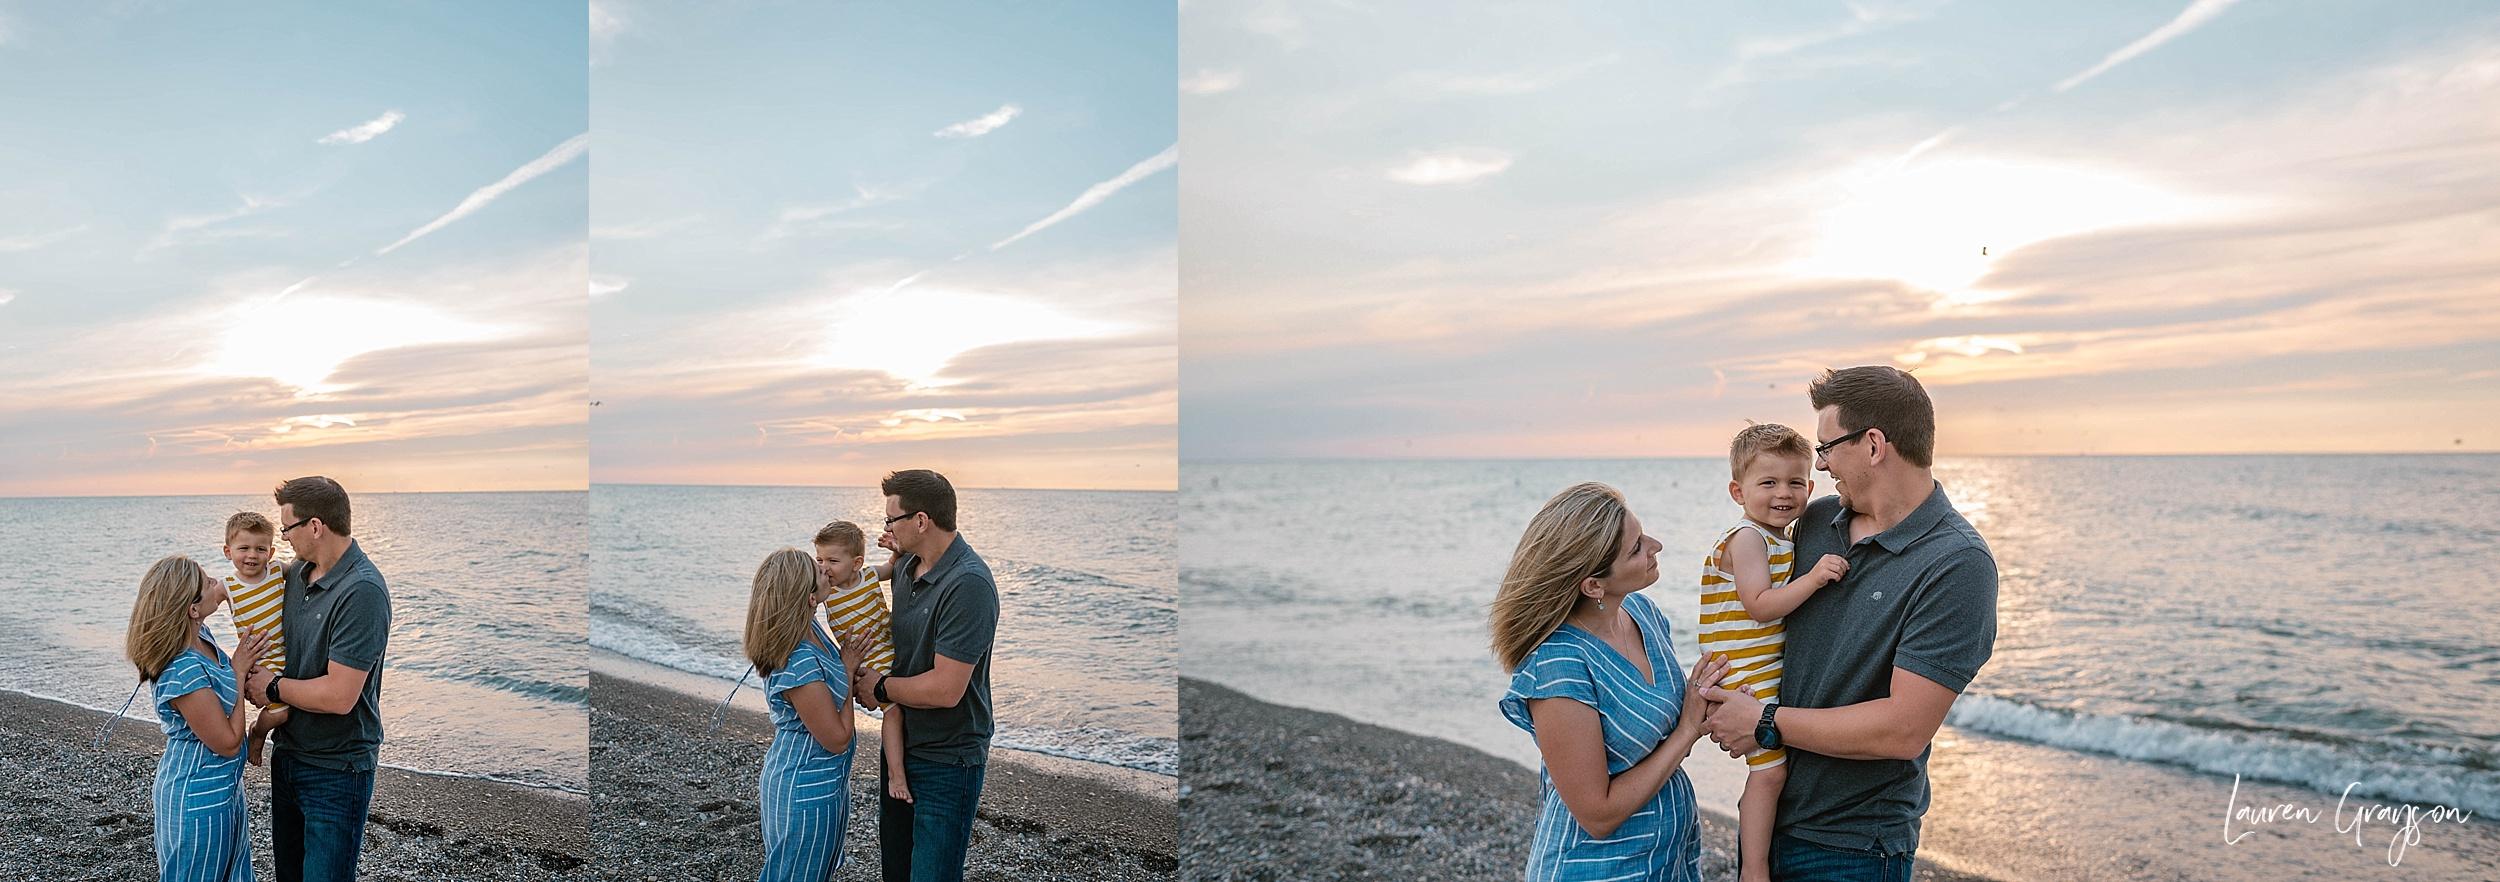 lauren-grayson-photography-cleveland-ohio-photographer-mentor-headlands-beach-maternity-session-2018_0768.jpg